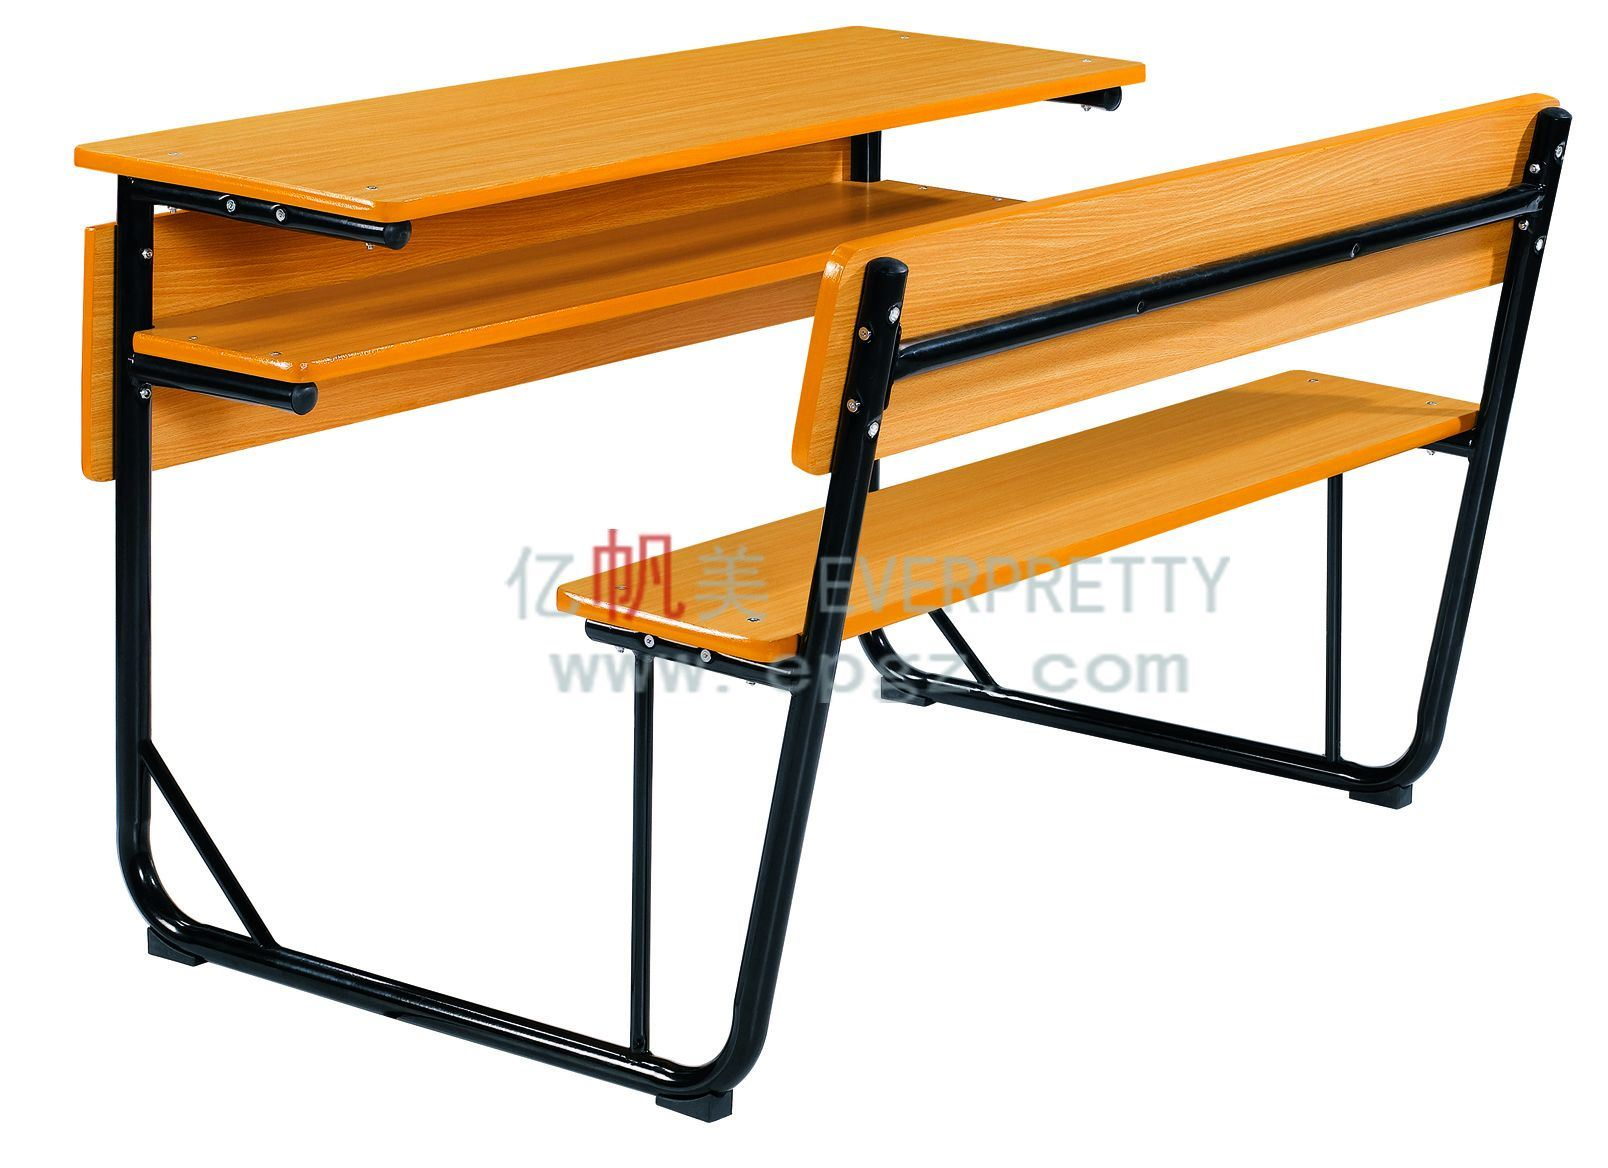 School Desk And Chair Combo school desk chair comboInteresting 20  School Desk And Chair Combo Design Ideas Of School  . School Desk And Chair Combo. Home Design Ideas